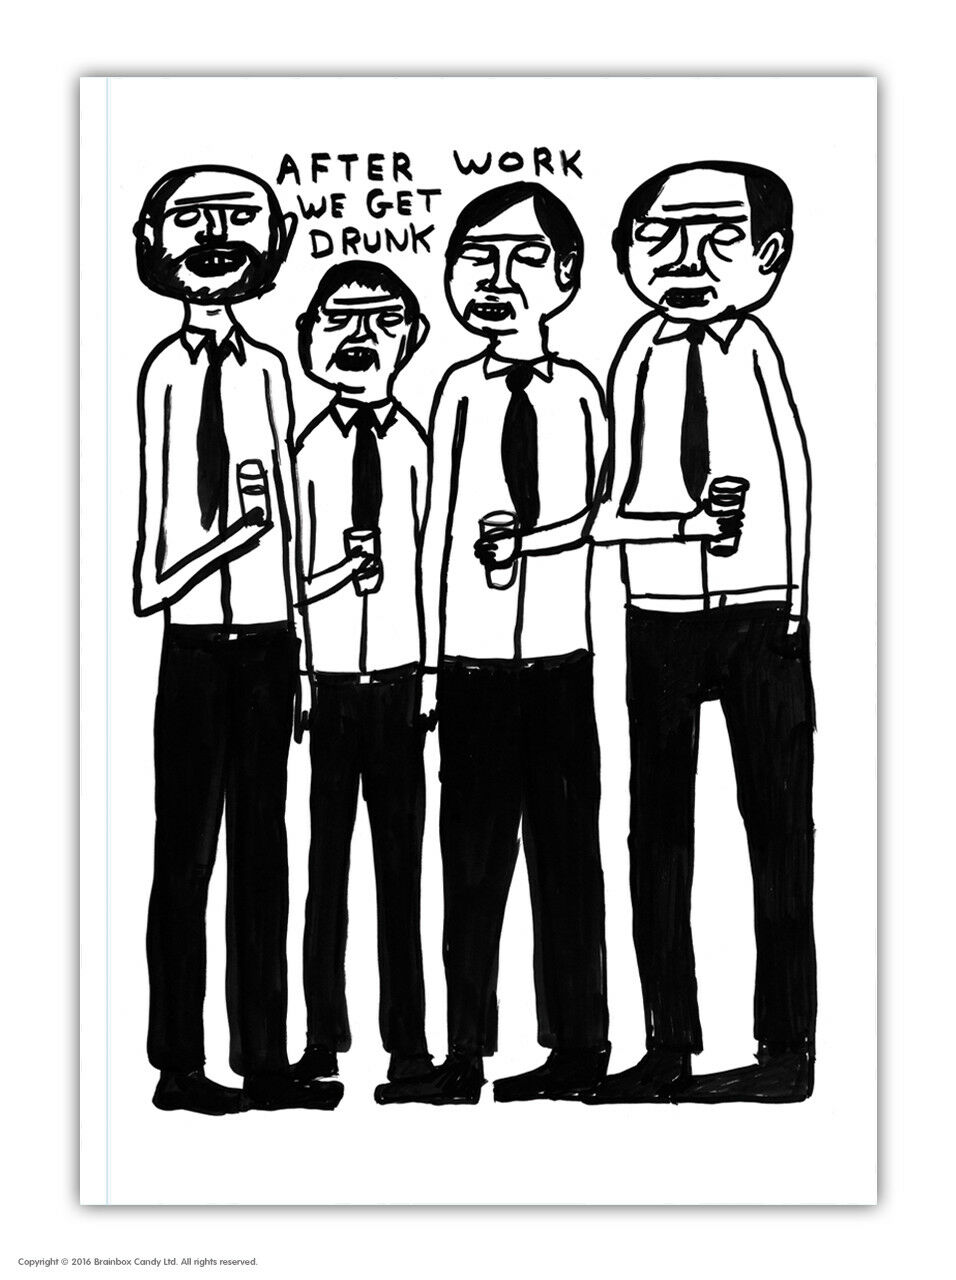 David Shrigley A5 Notepad Notebook Jotter Journal Funny Comedy Humour Joke Gift